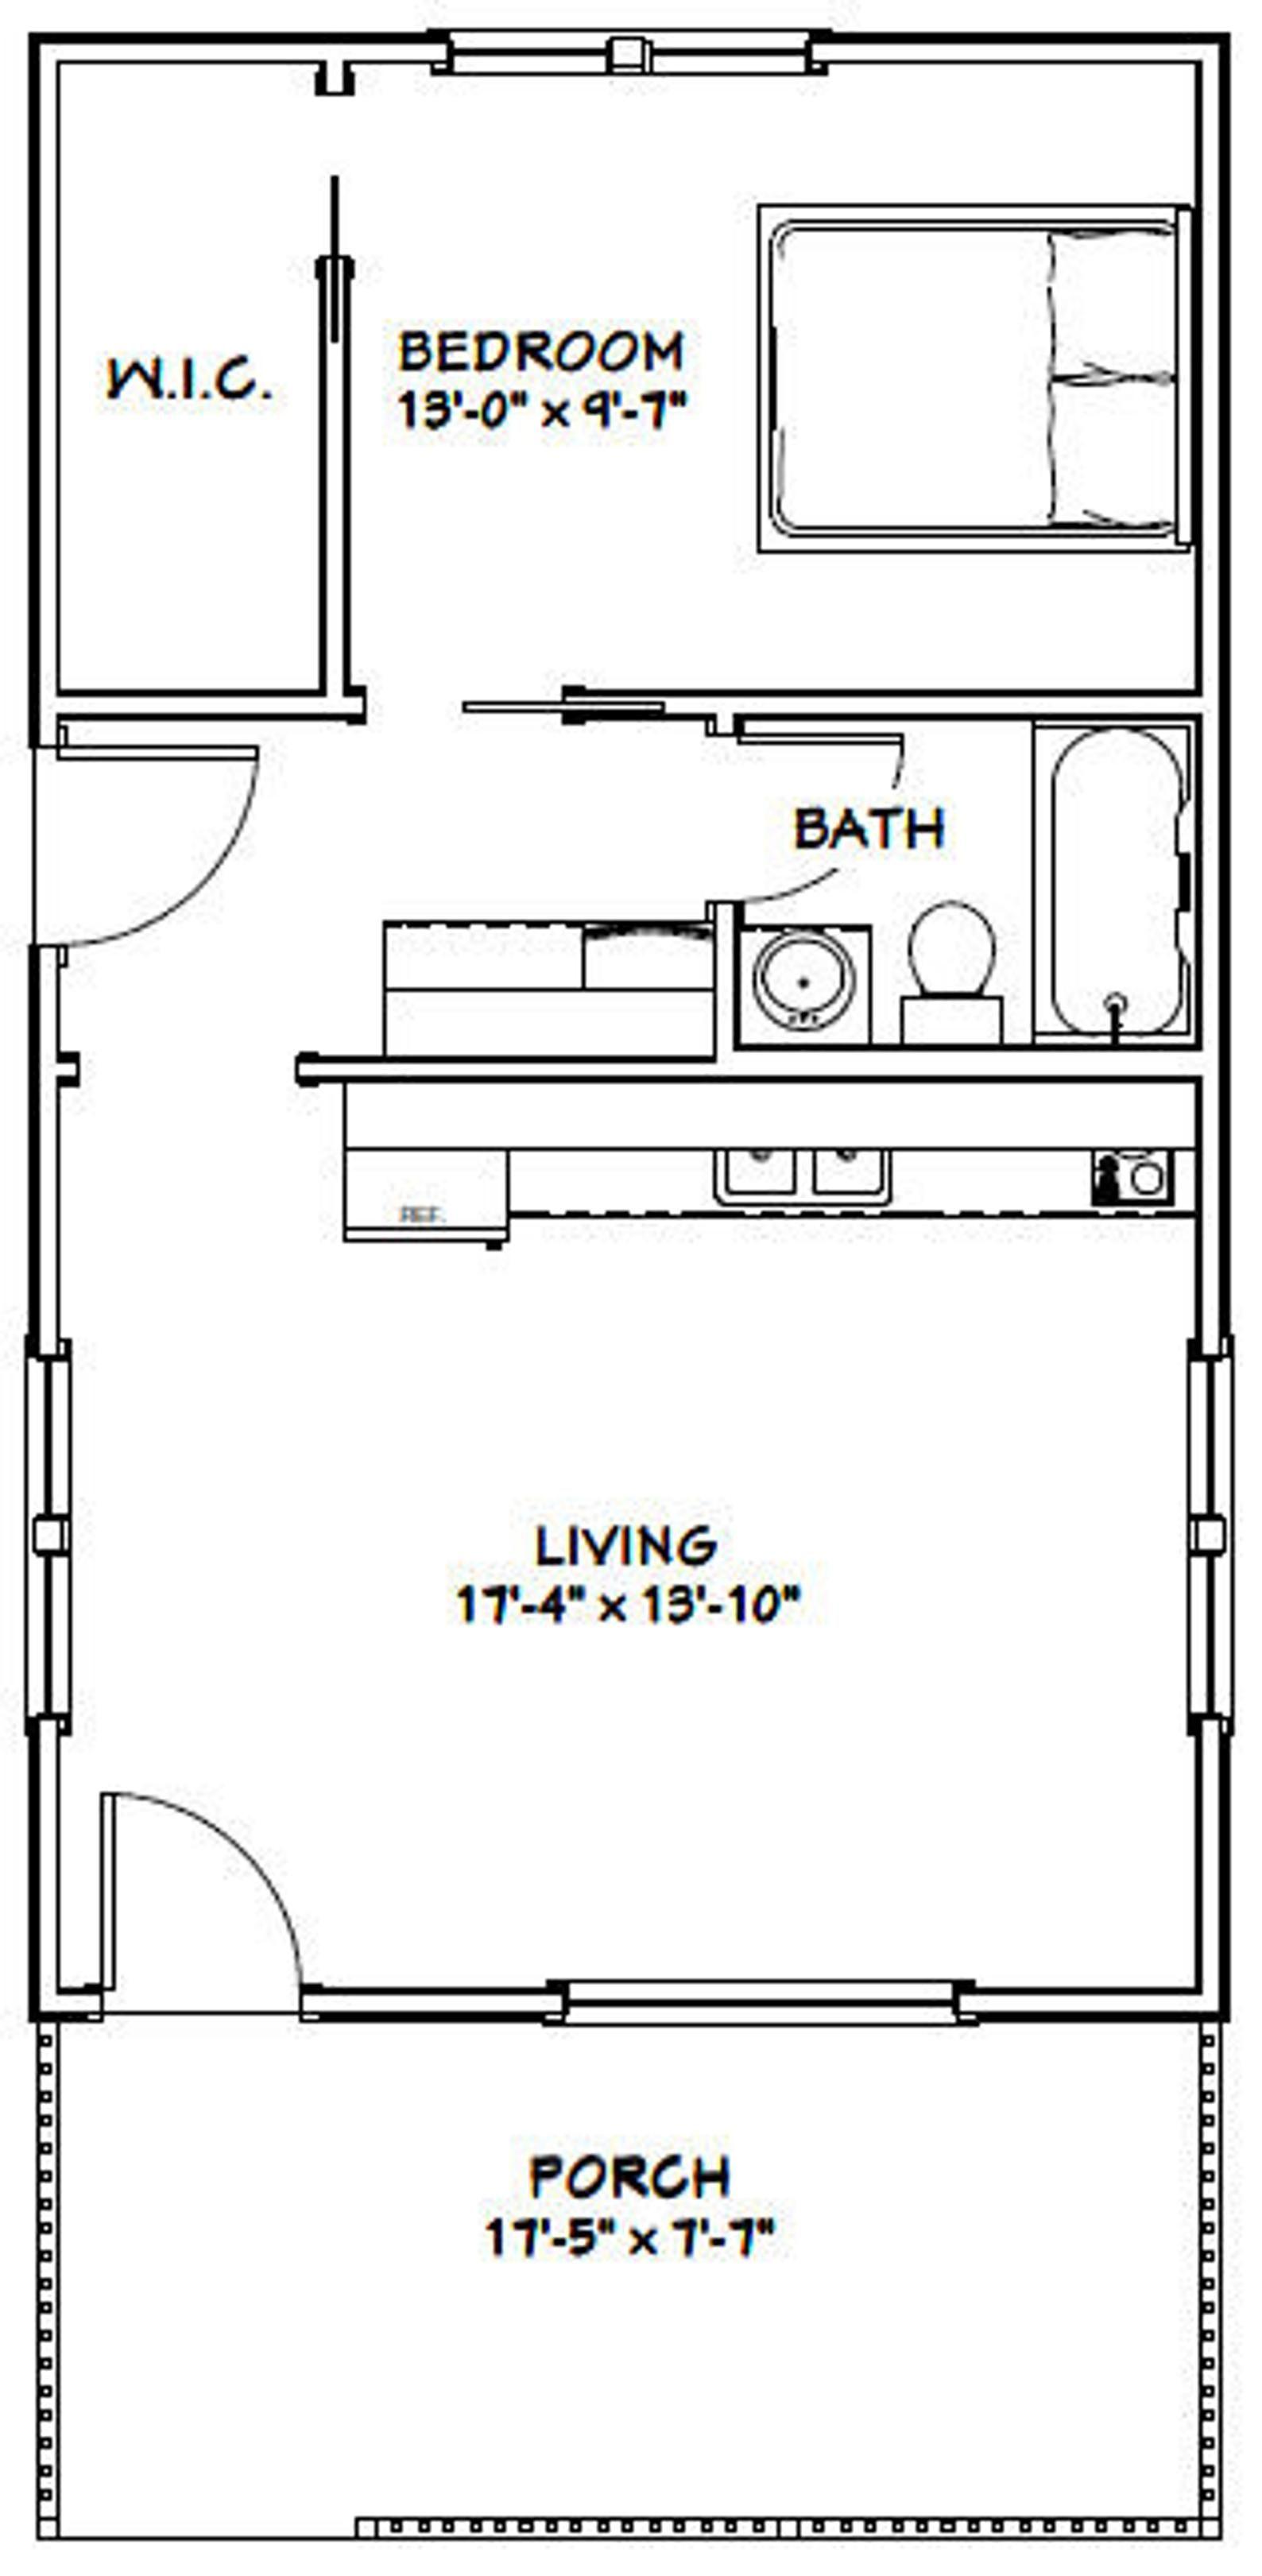 18x30 House 1 Bedroom 1 Bath 540 sq ft PDF Floor Plan Instant Download Model 4H